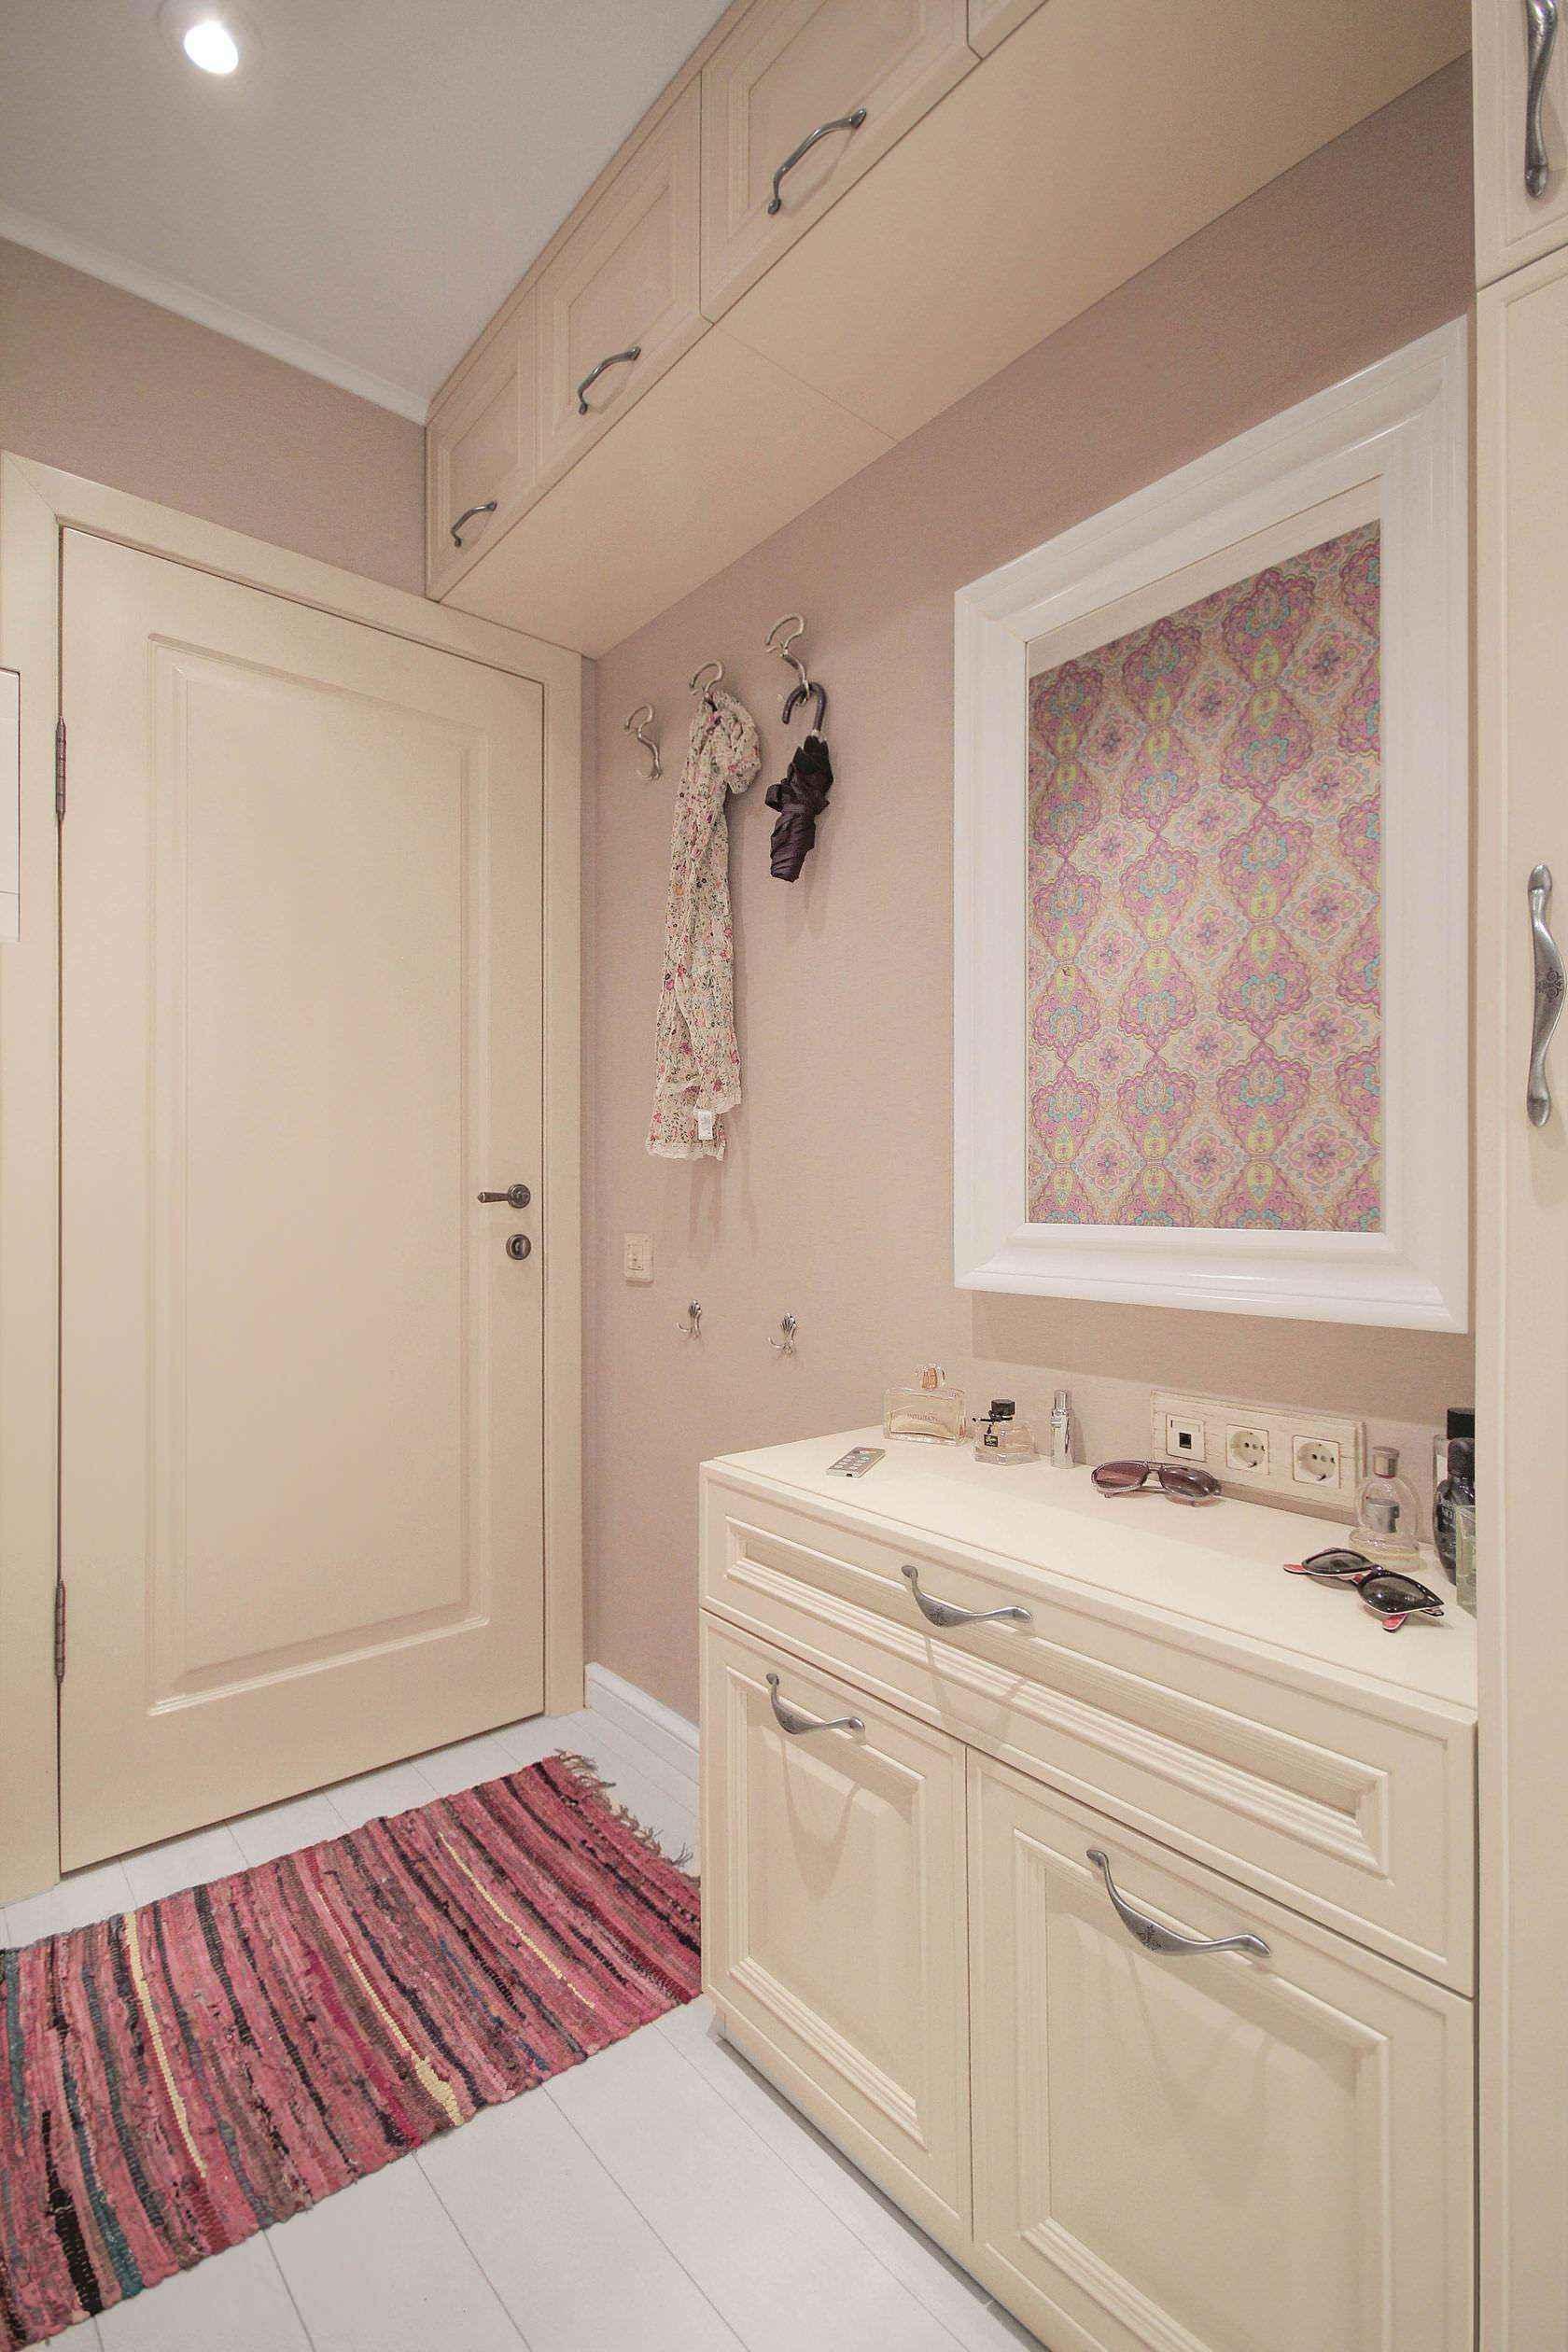 interer-dvukhkomnatnoj-khrushchevki16 | Авторский дизайн двухкомнатной хрущевки 45 кв. м. в стиле прованс